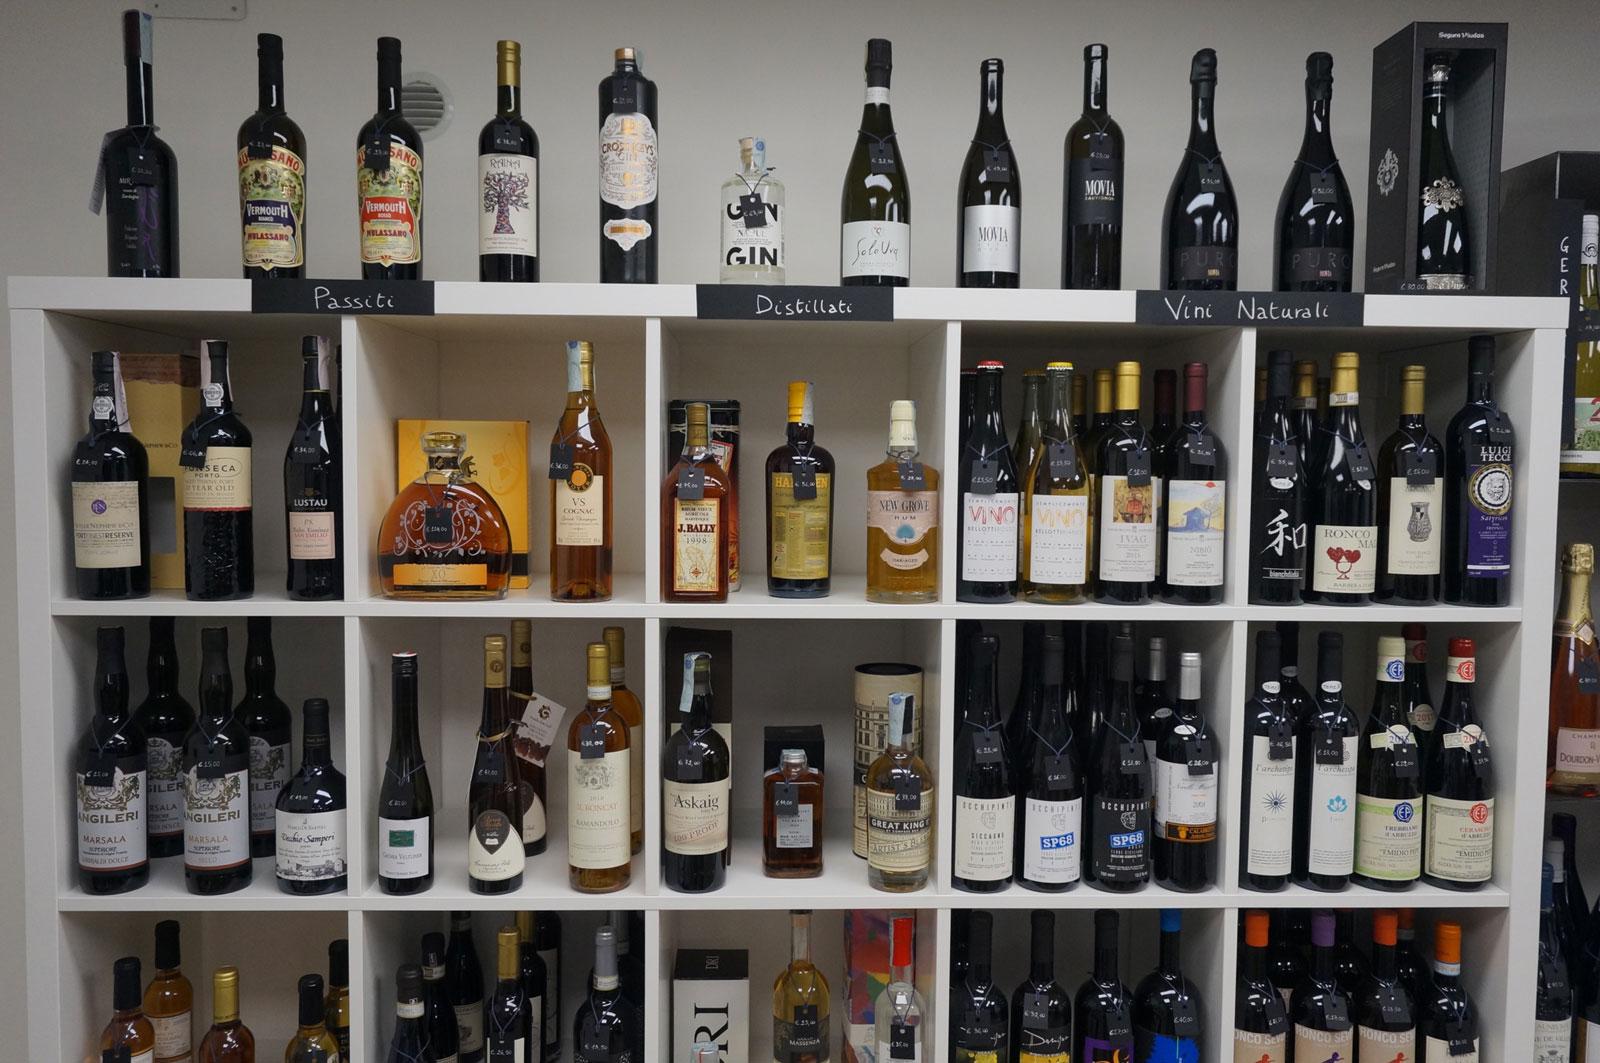 Vini naturali, passiti e distillati dell'Enoteca Botrytis